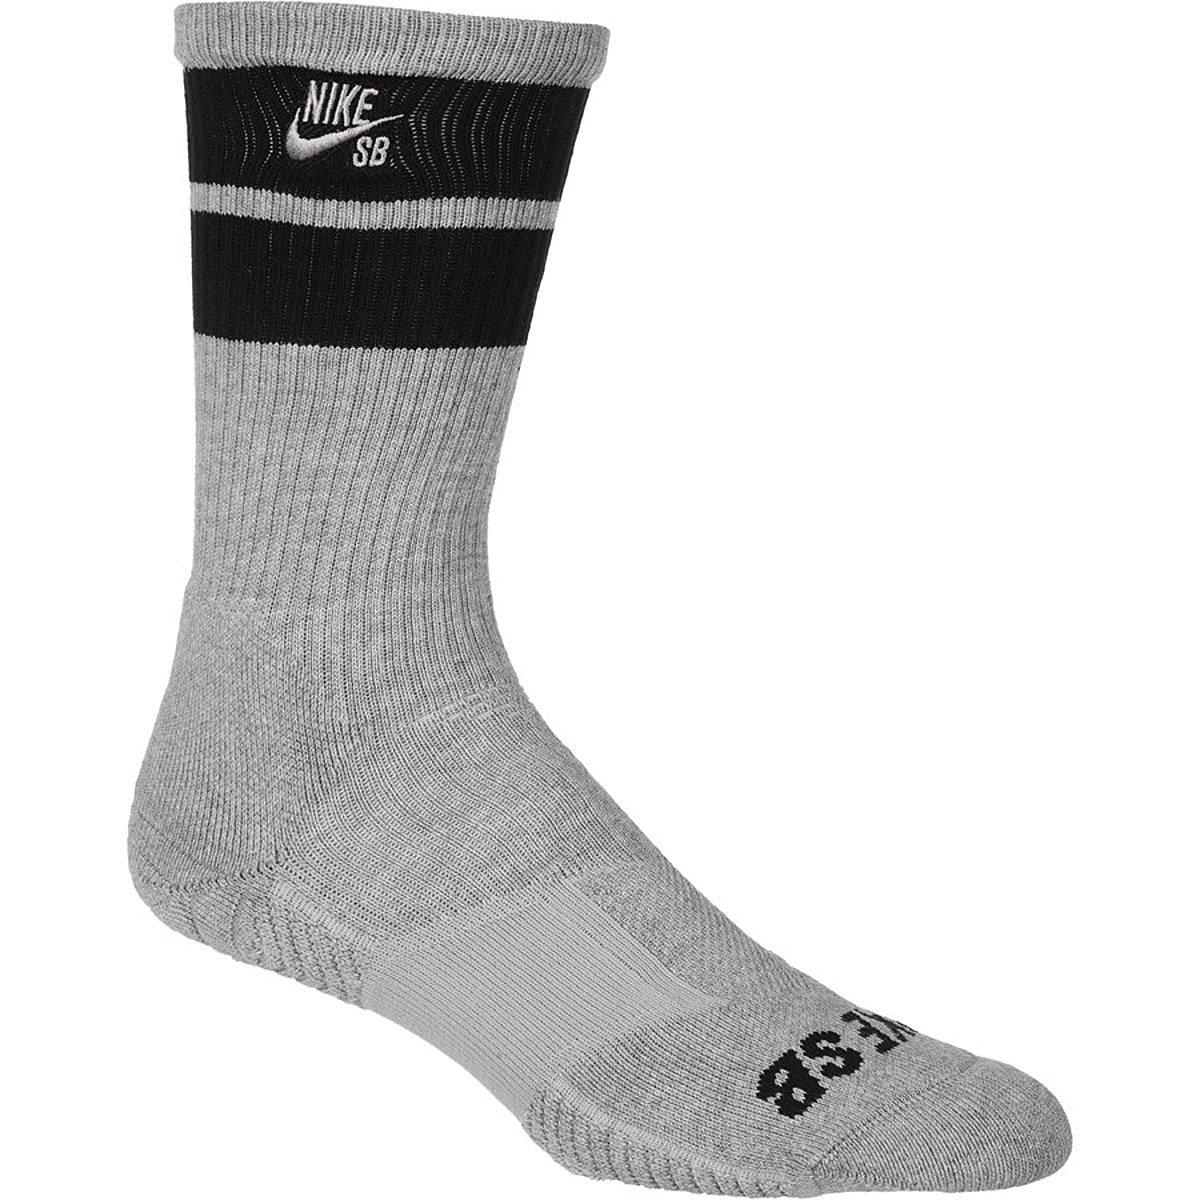 Nike Pony Sb Elite Crew Mens Sock Dark Grey Heather/Black/ Medium / 6-8